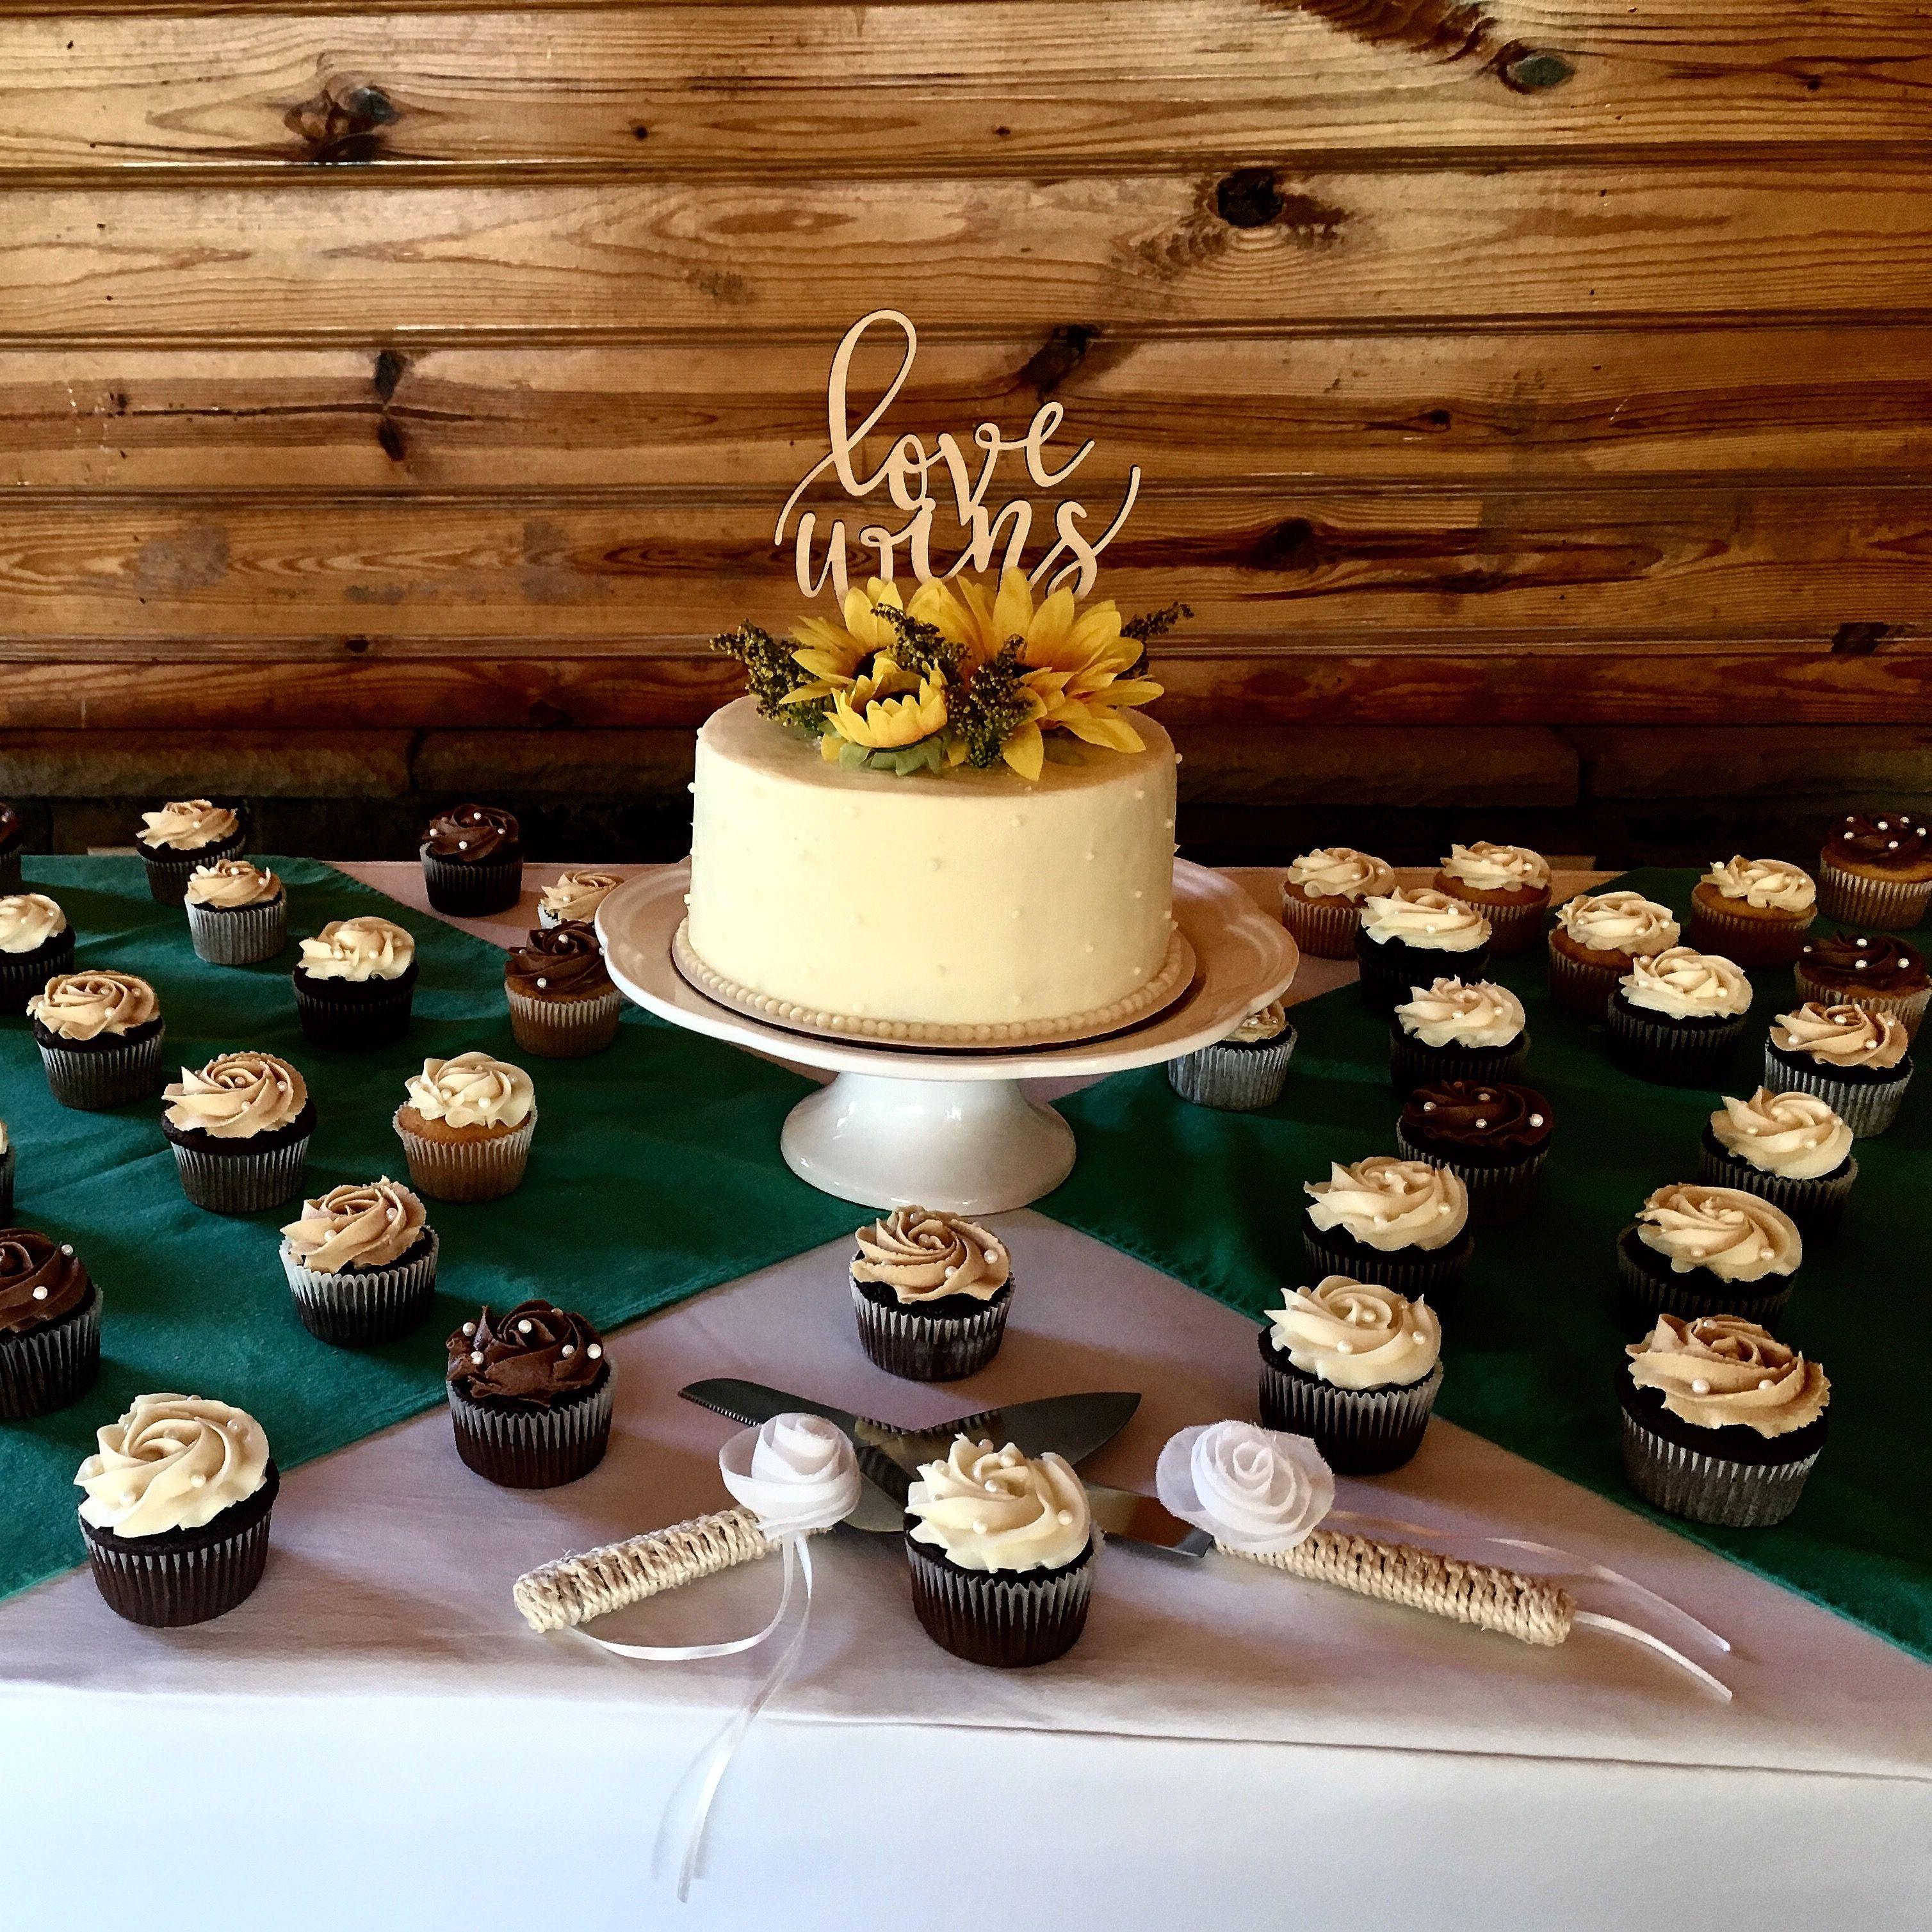 Simple rustic wedding cake and cupcakes Wedding cupcakes